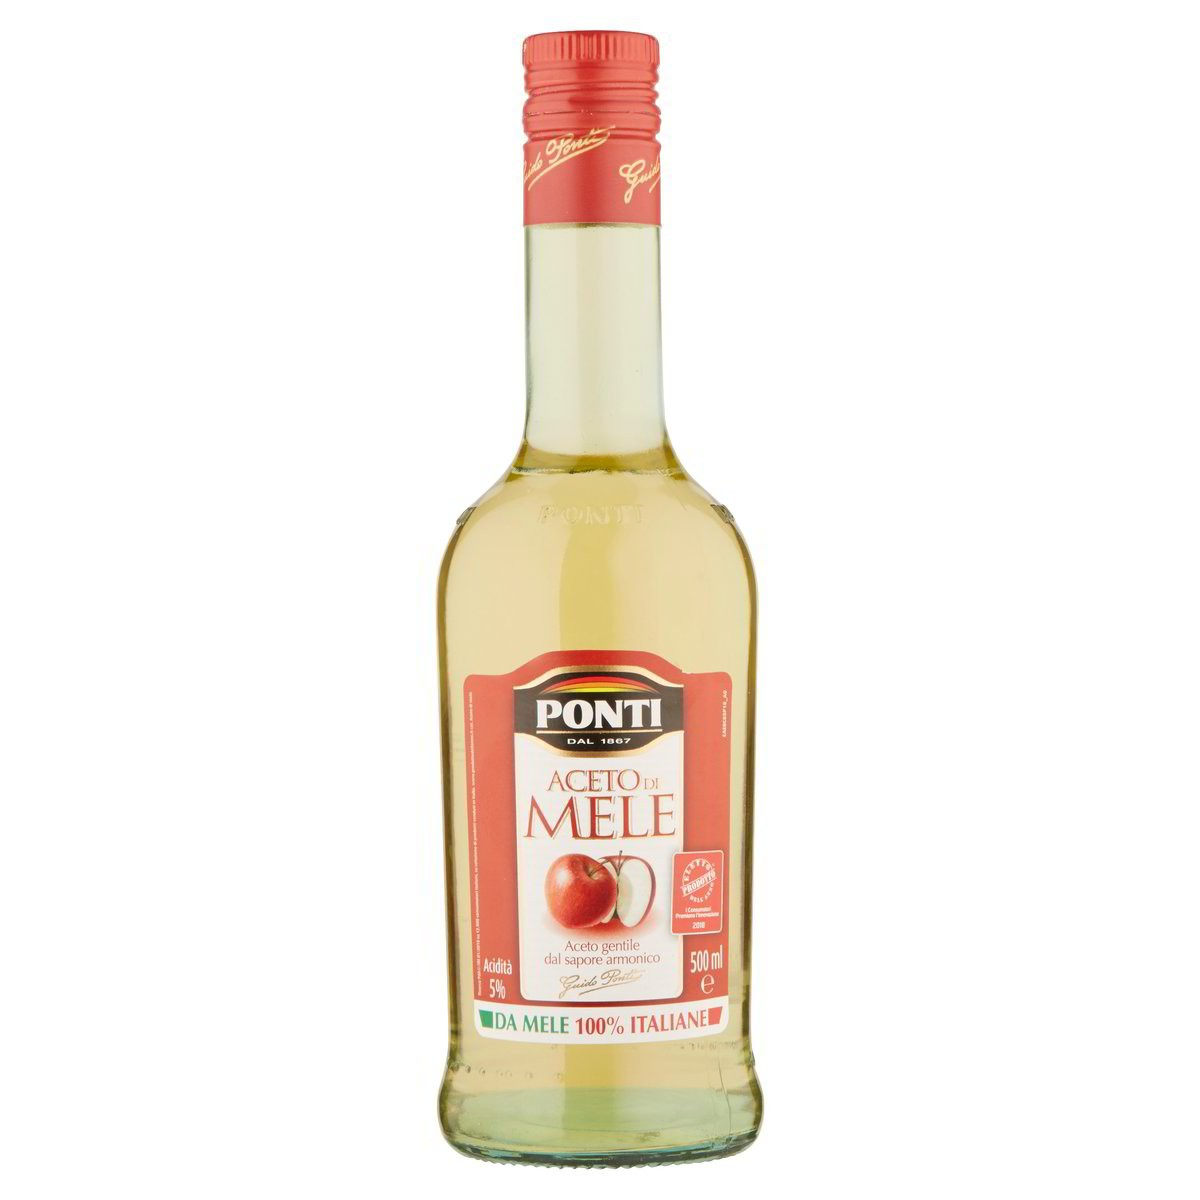 Ponti Aceto di mele 100% italiane